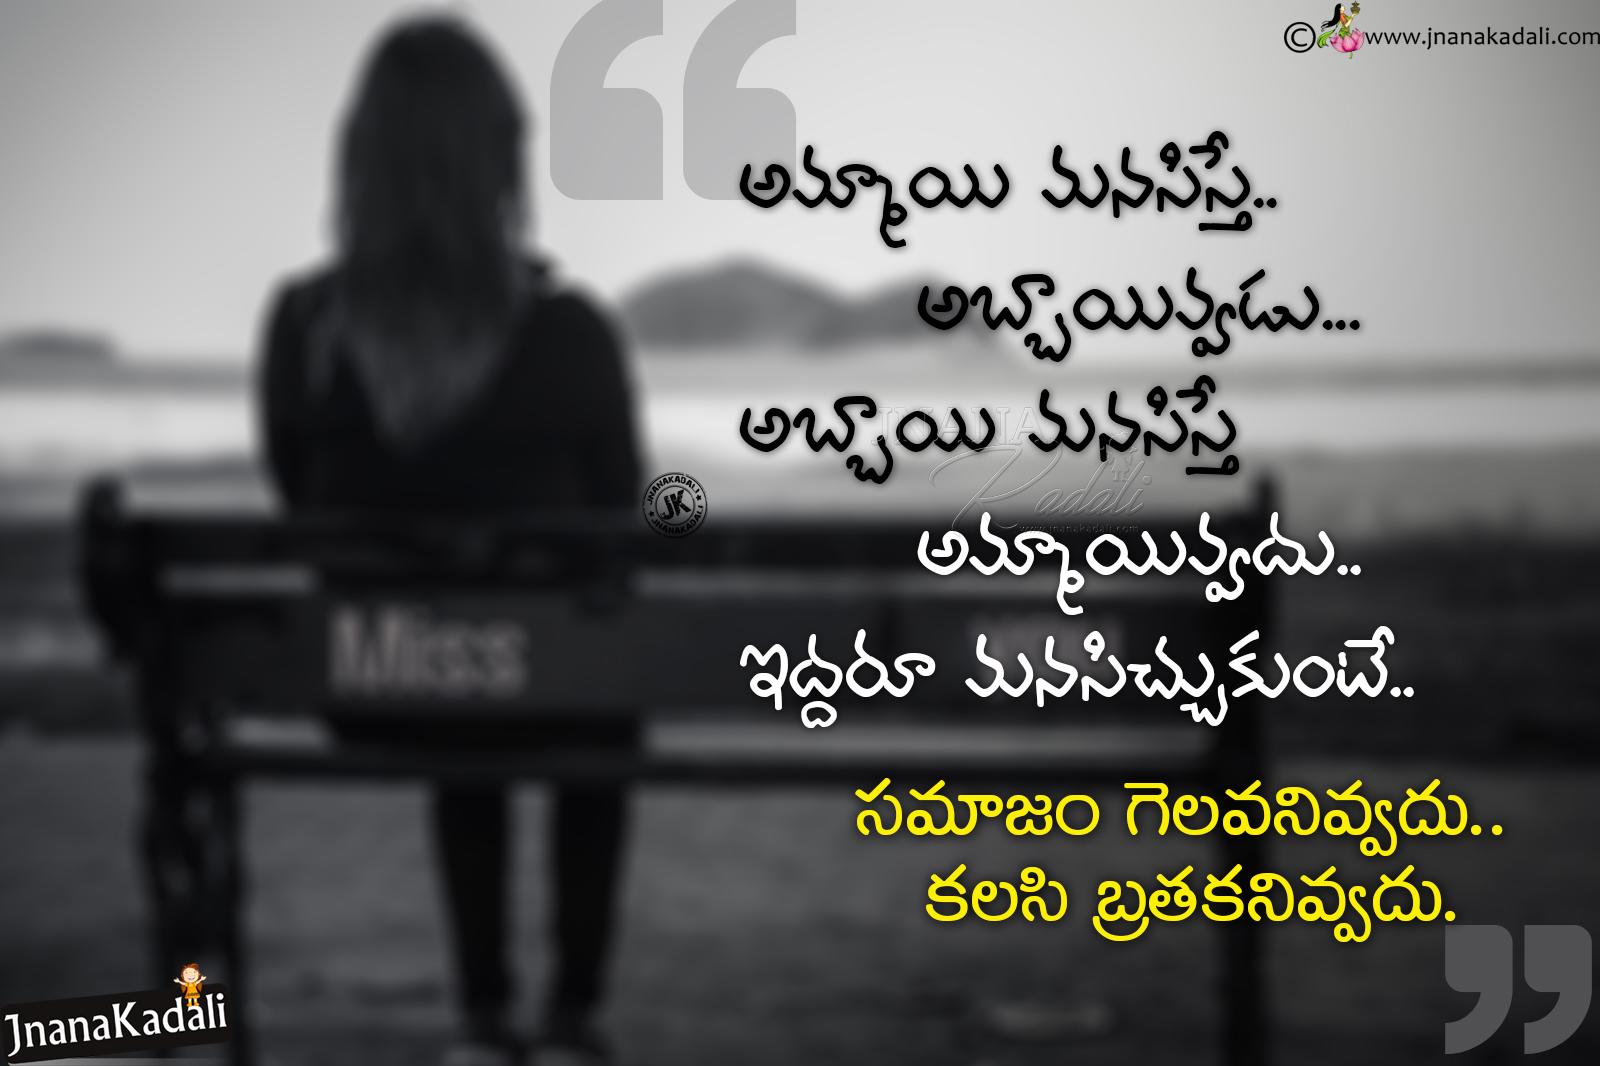 Love Quotes Hd Images In Telugu Vinny Oleo Vegetal Info